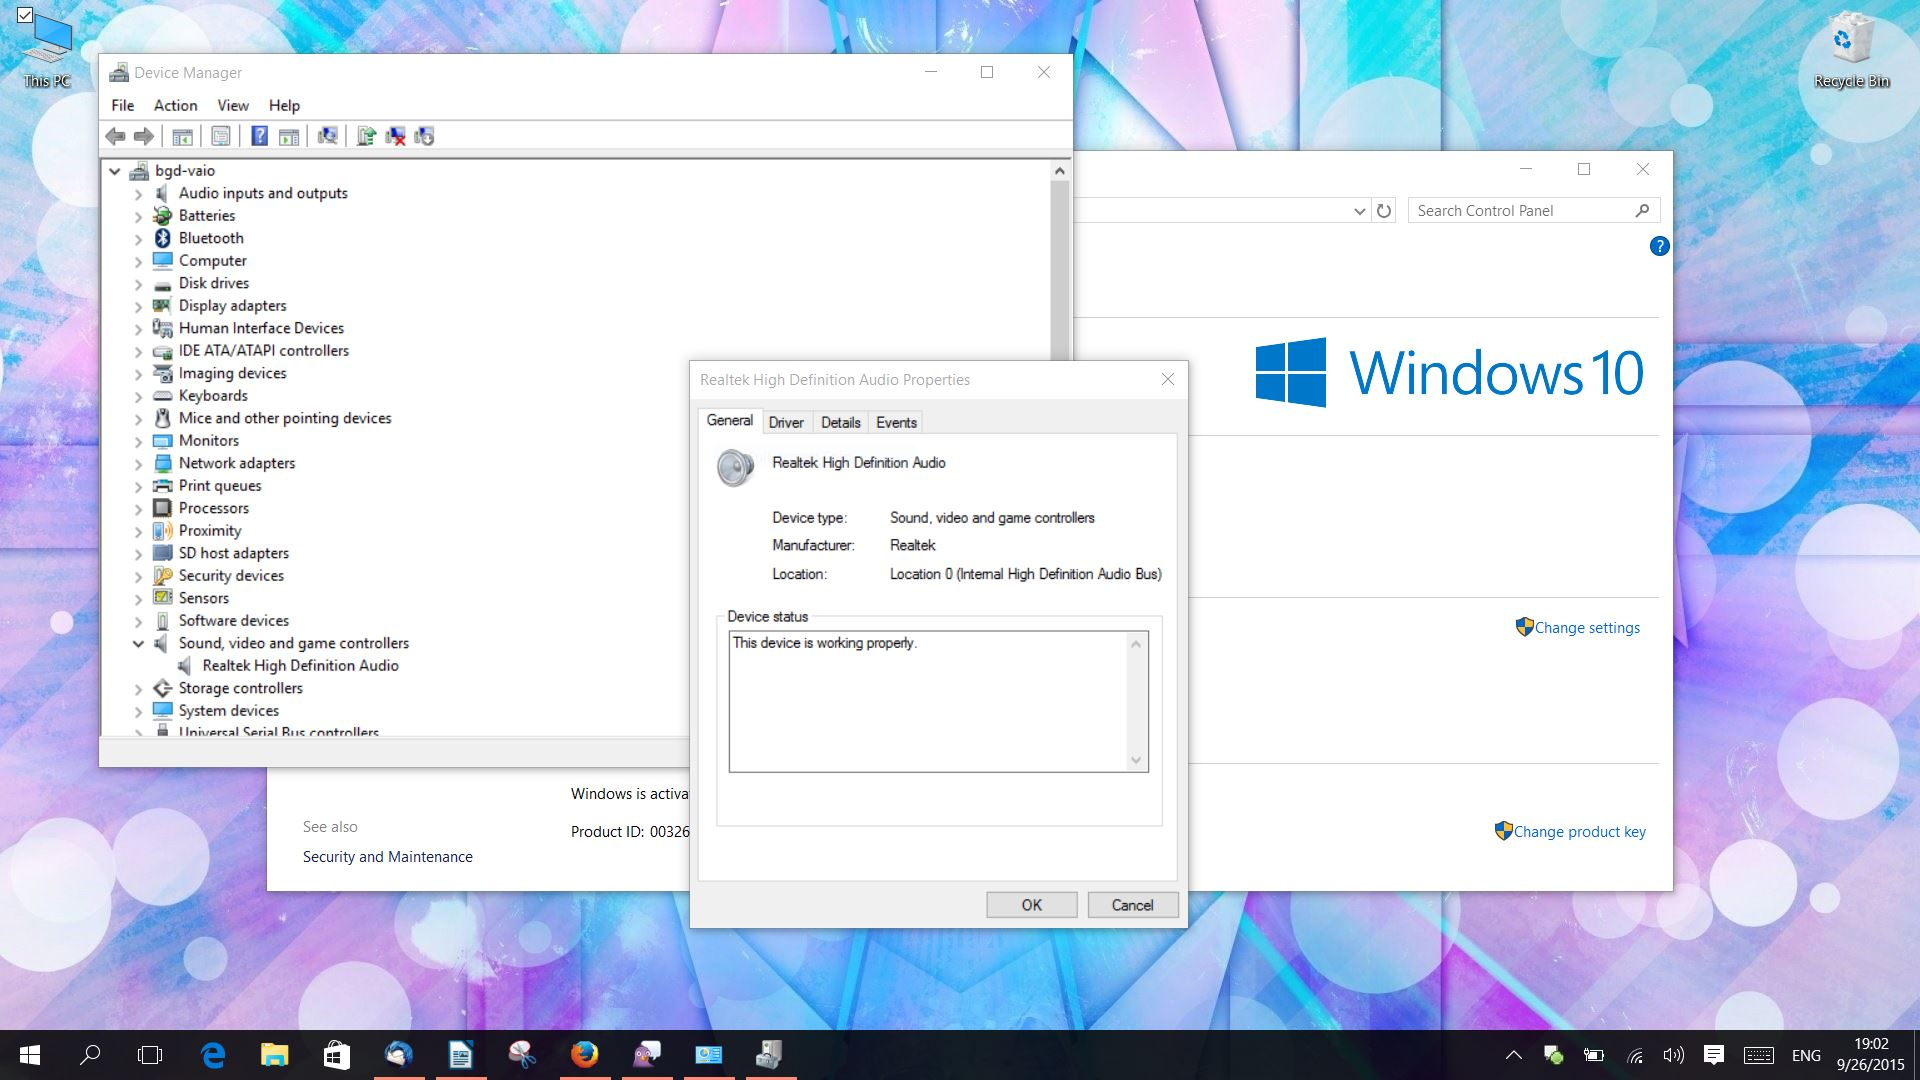 realtek audio drivers windows 10 no sound